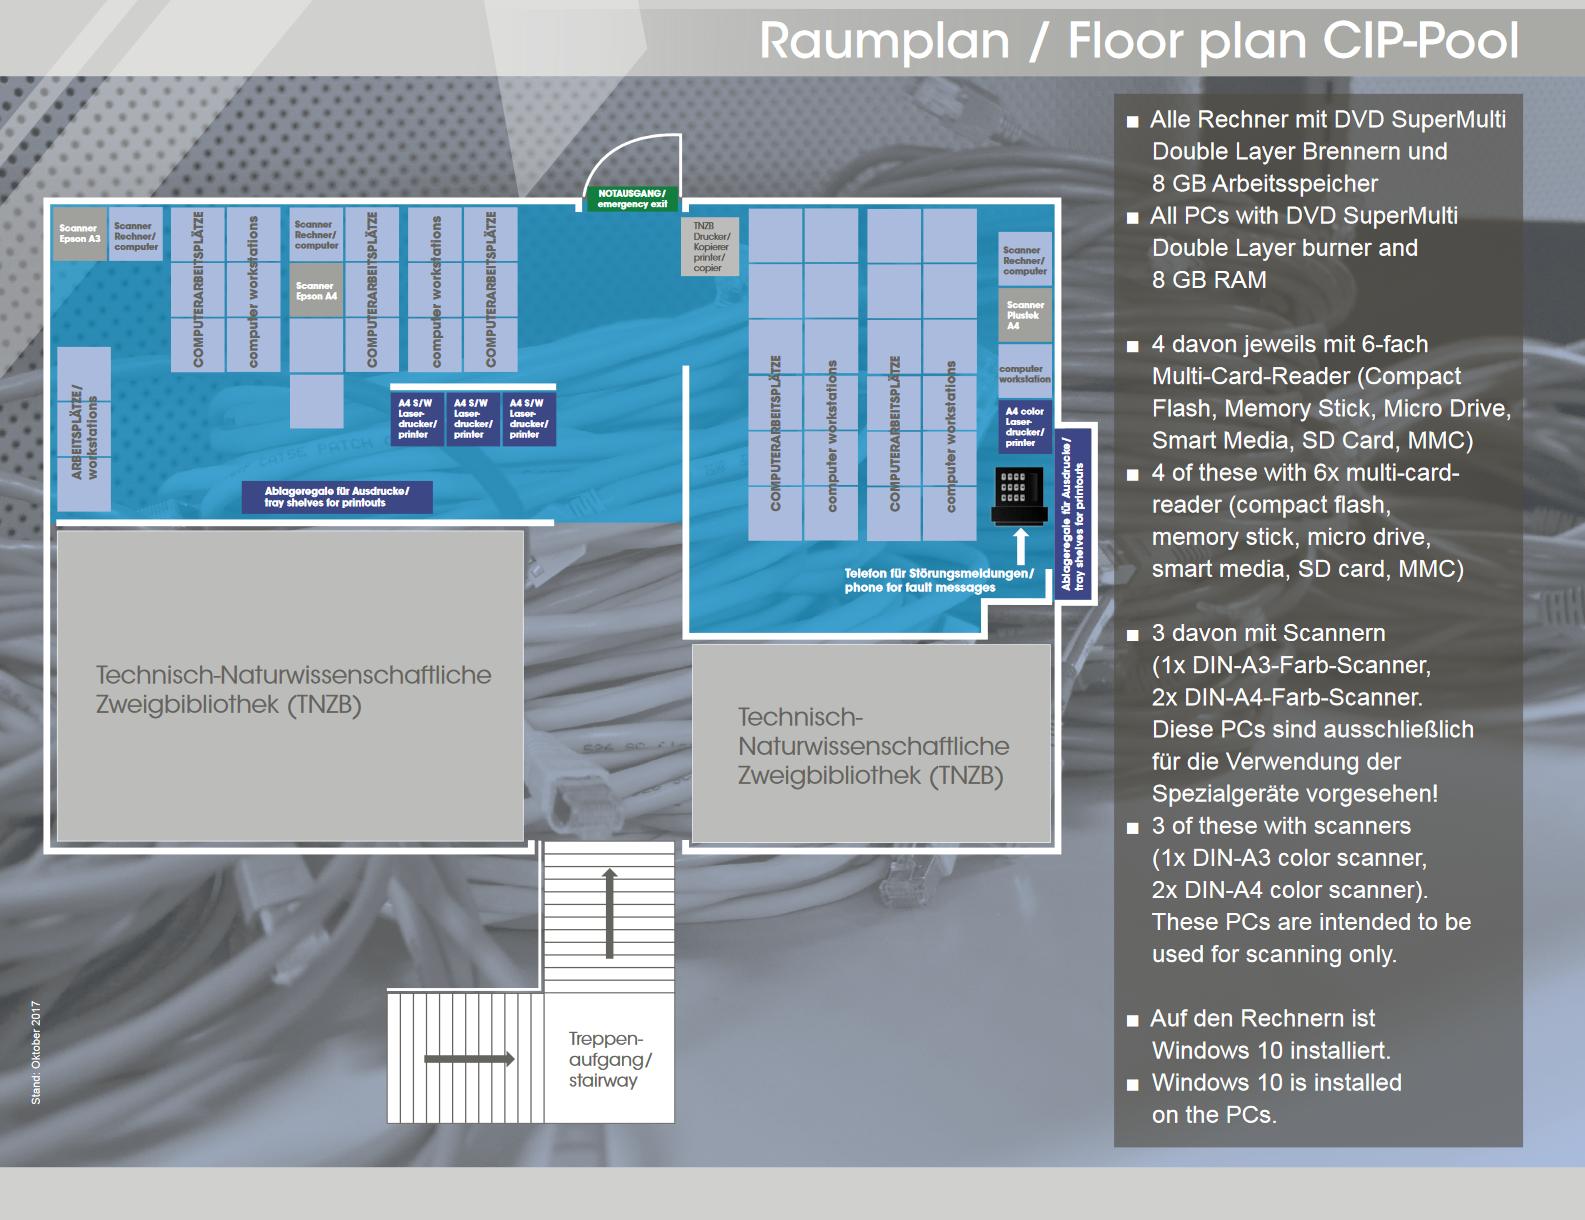 Abb. CIP-Pool Raumplan